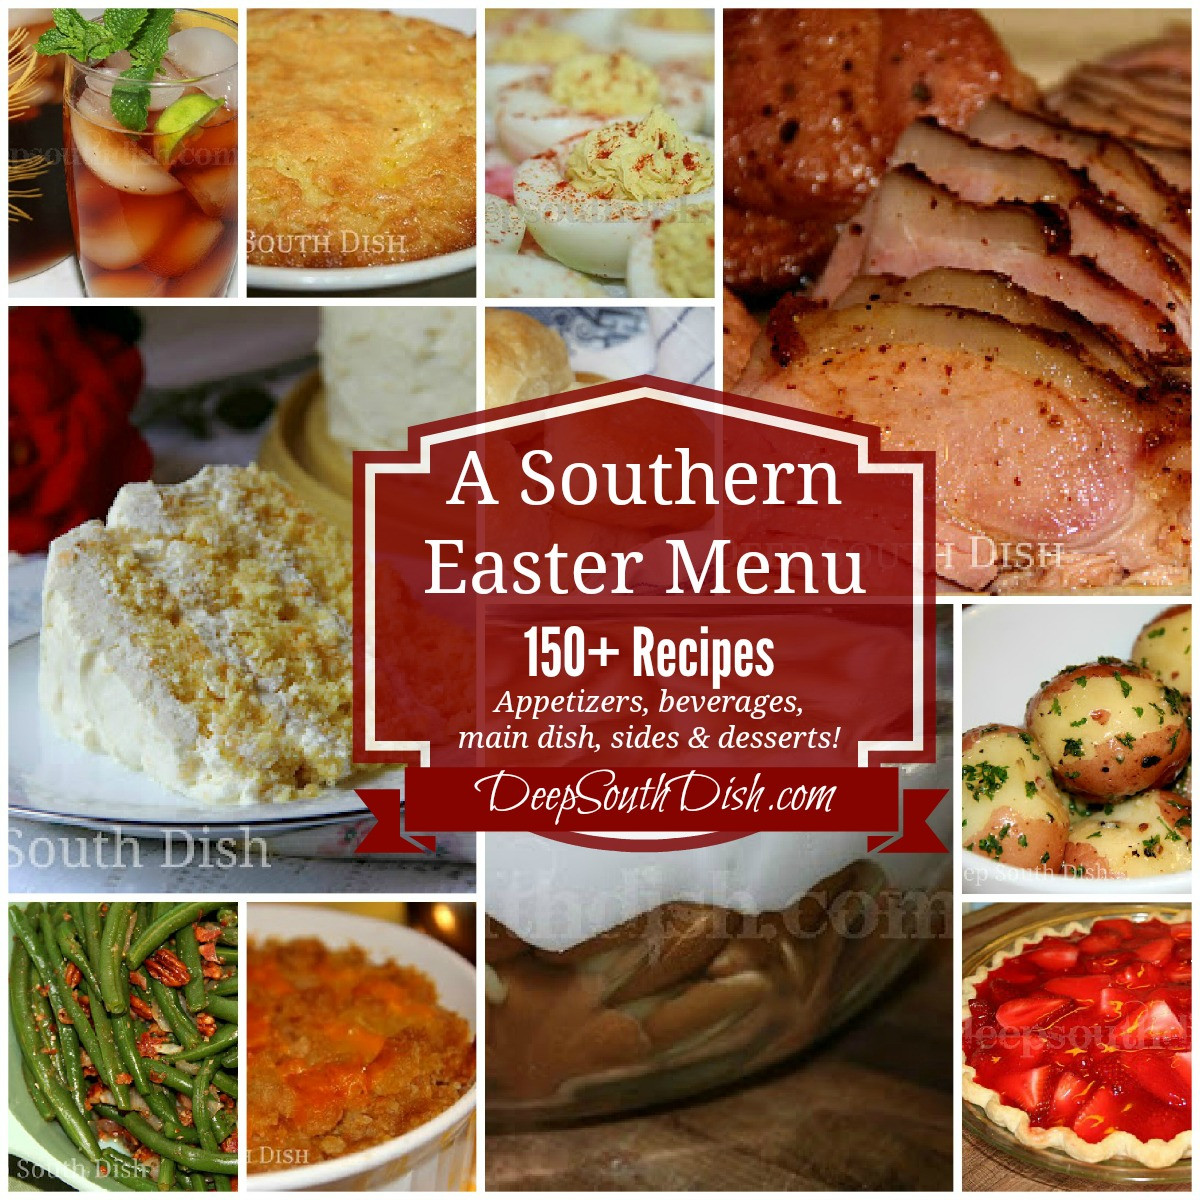 Soul Food Christmas Dinner Menu  Deep South Dish Southern Easter Menu Ideas and Recipes